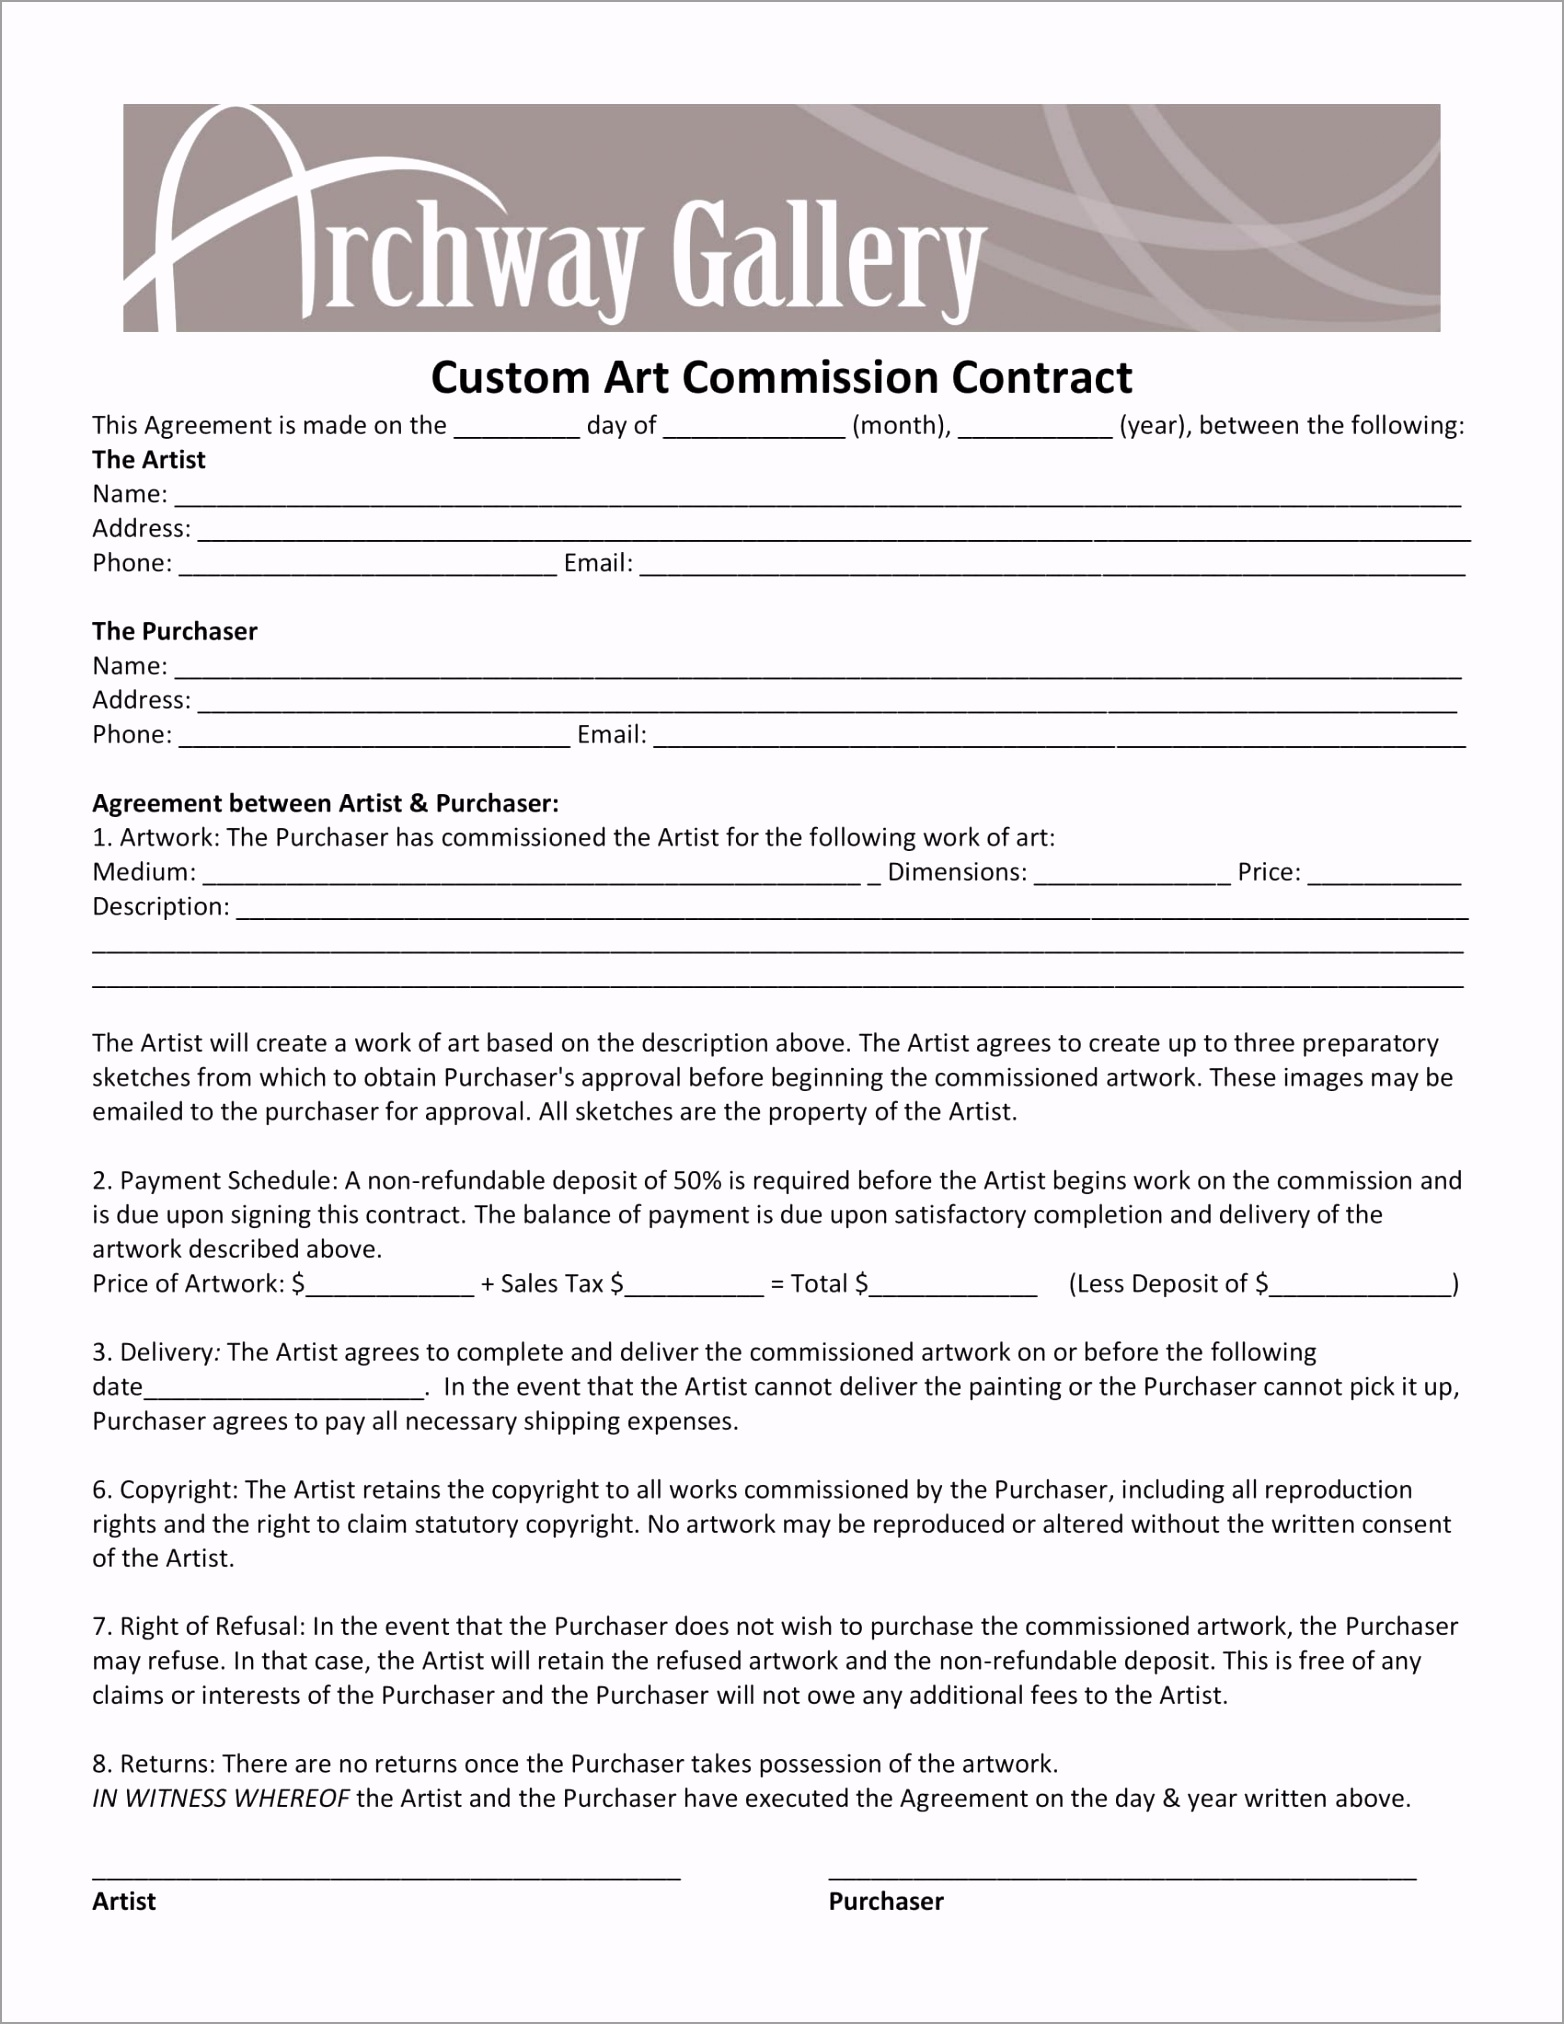 Custom Art mission Contract Form 1 etiha